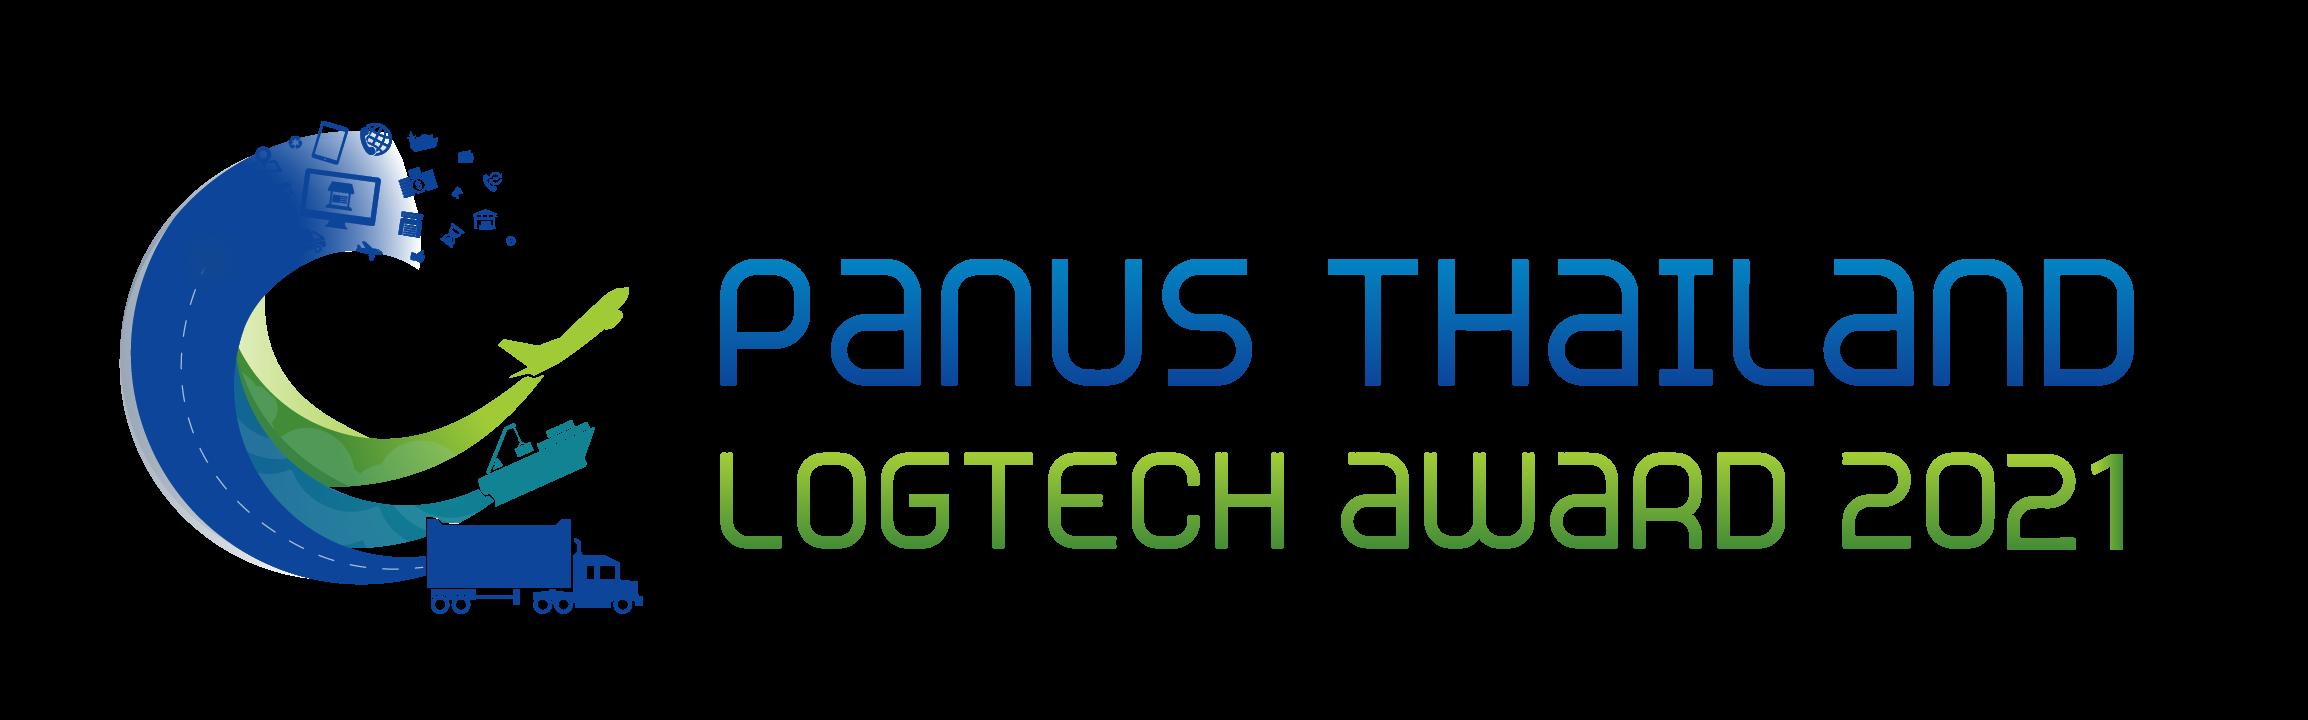 Panus Thailand LogTech Award 2021